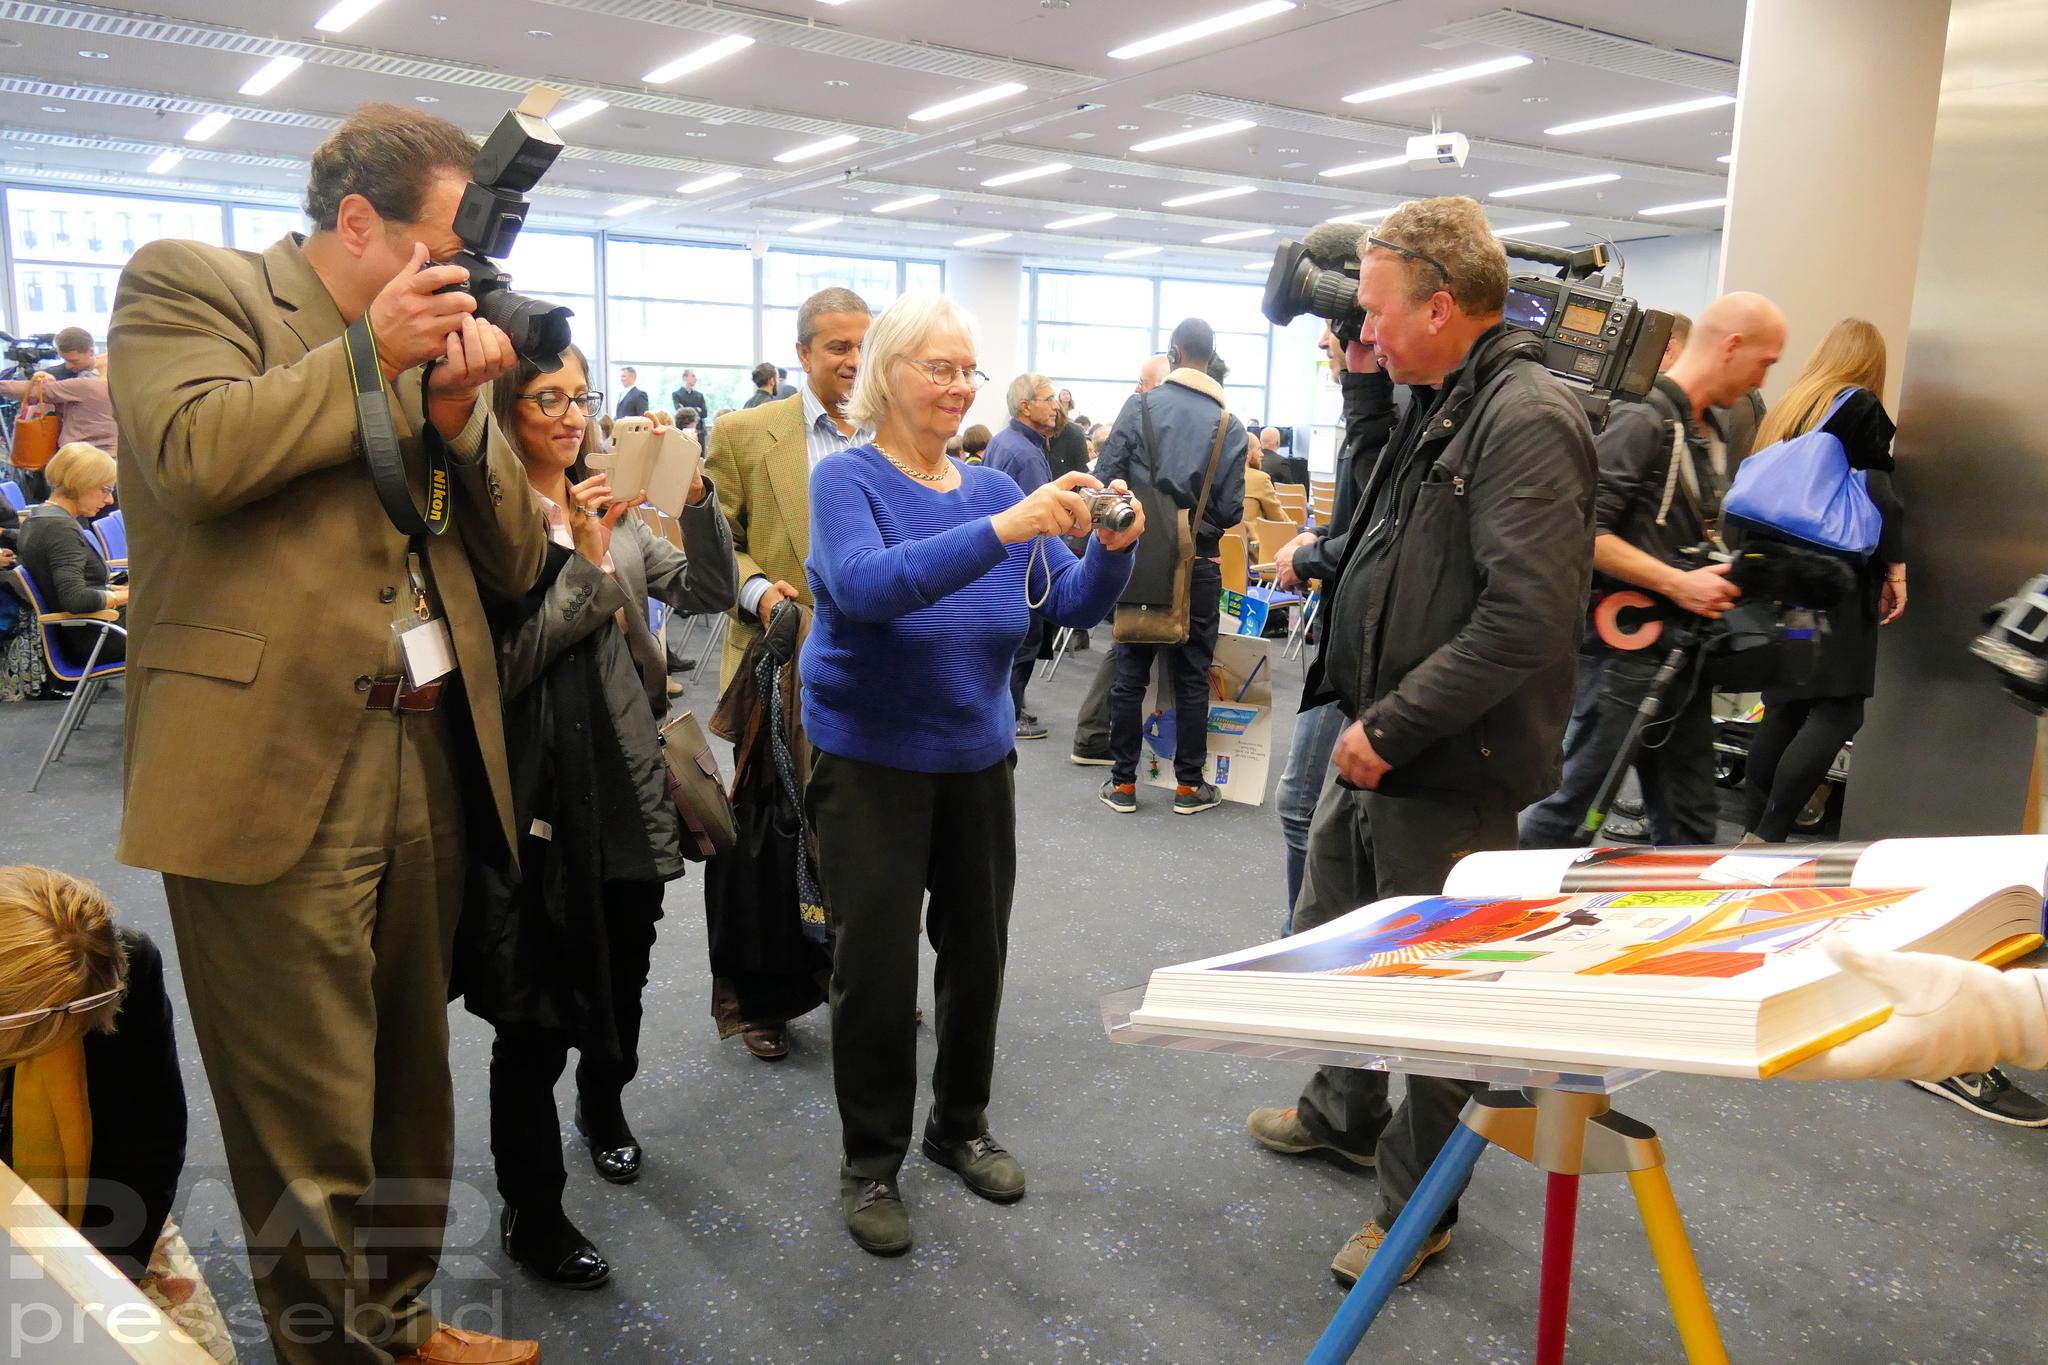 Medieninteresse © rheinmainbild.de/Klaus Leitzbach